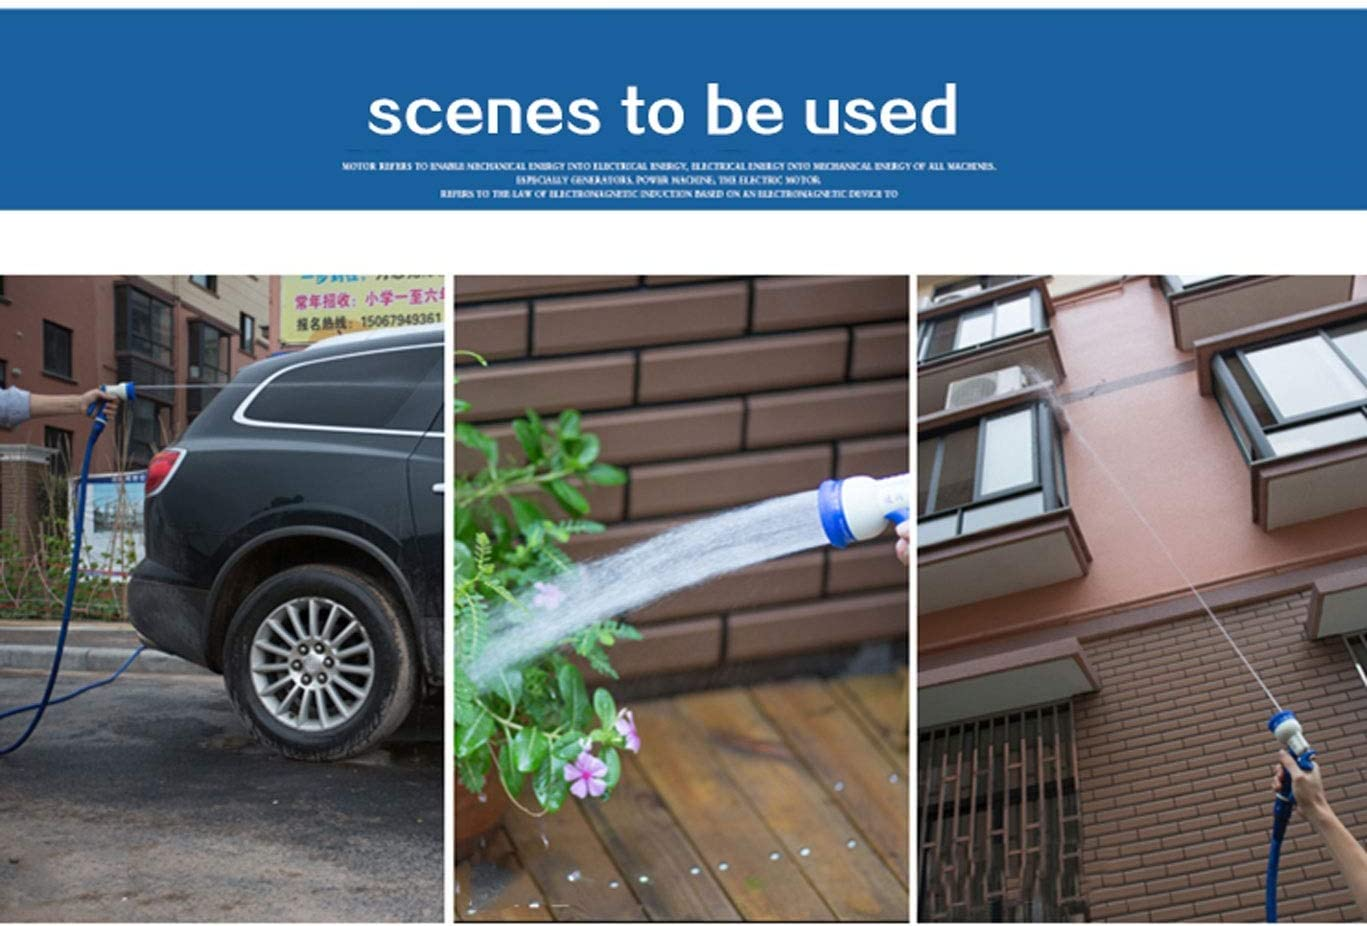 YXZQ Garden Hose, Expandable 6 Functions Spray Gun 3 Times Telescopic Household Car Wash Water Gun for Garden Watering Pet Bath Blue